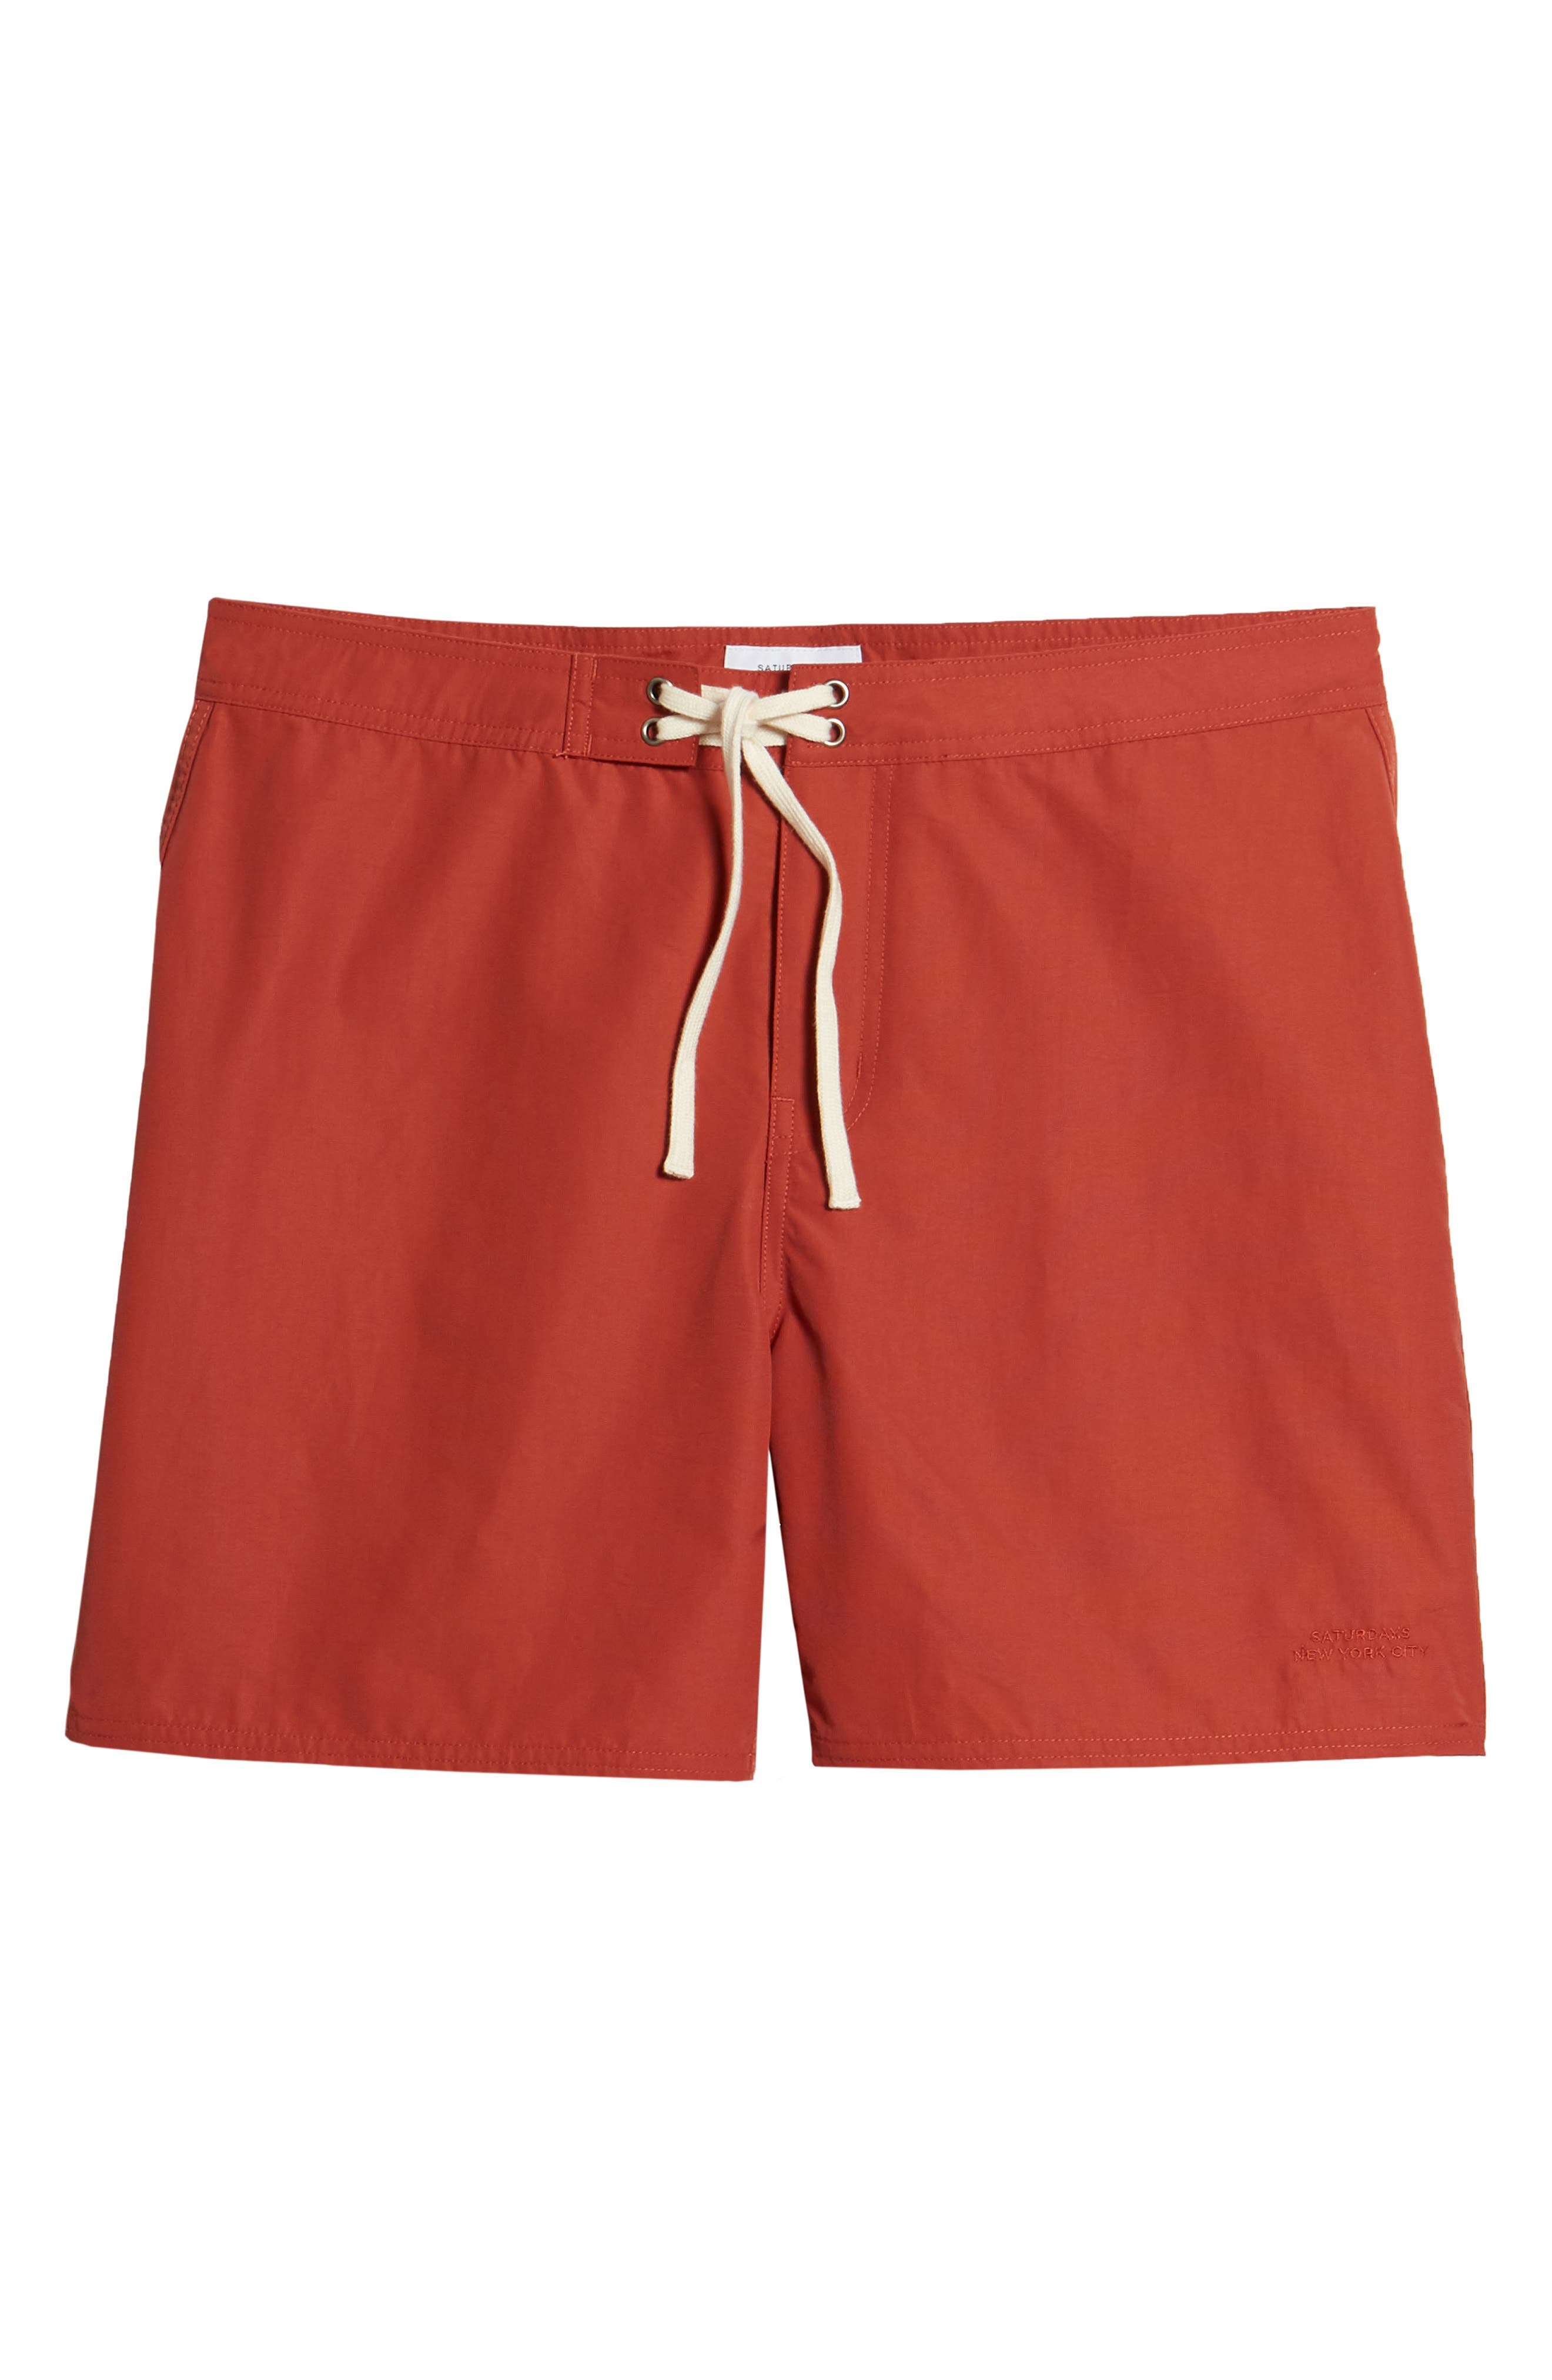 Colin Board Shorts,                             Alternate thumbnail 6, color,                             600